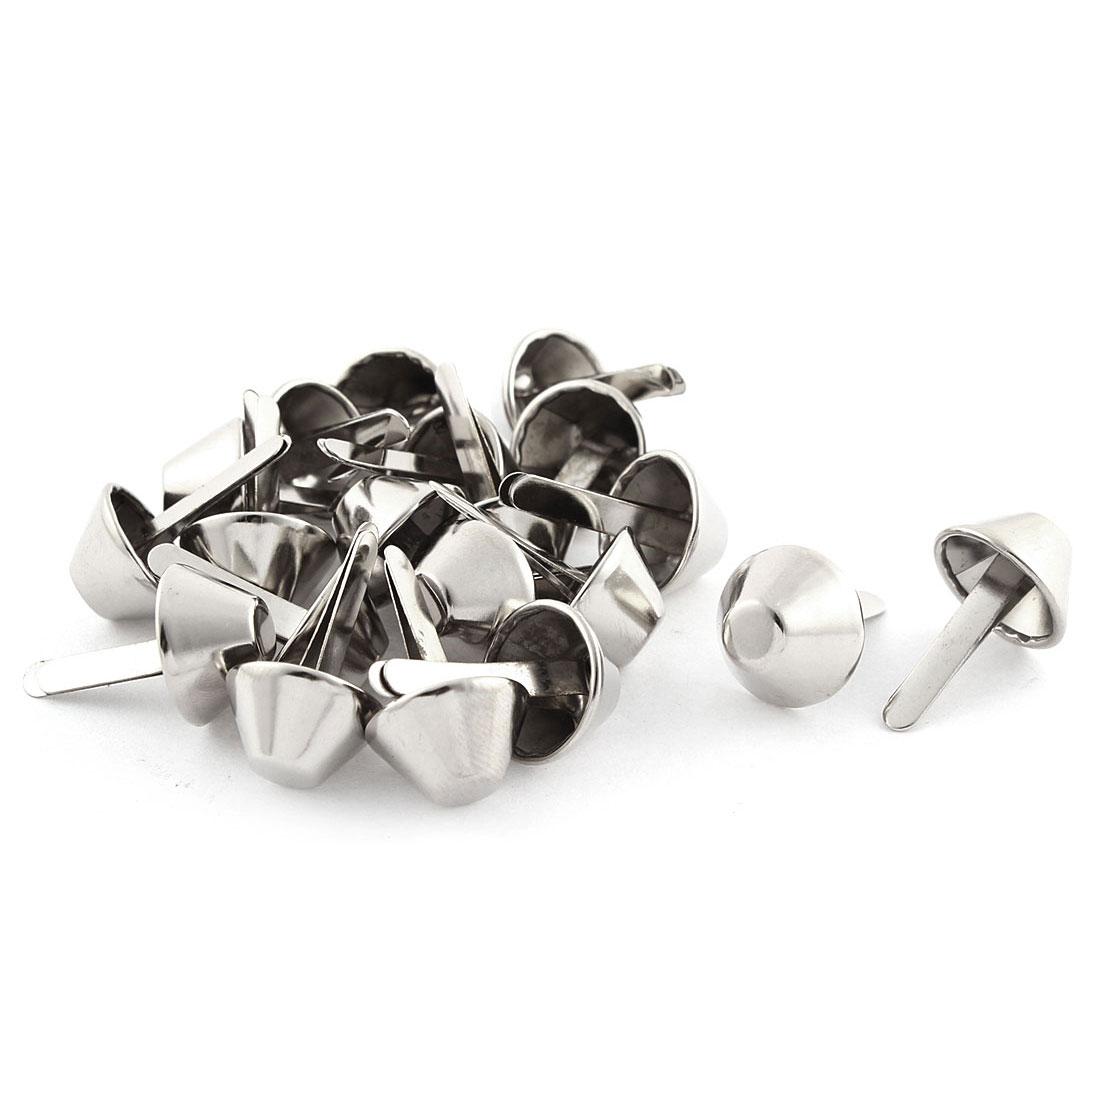 15mm Dia Lamp Shape Clothes Decorative Metal Split Rivets Silver Tone 20Pcs